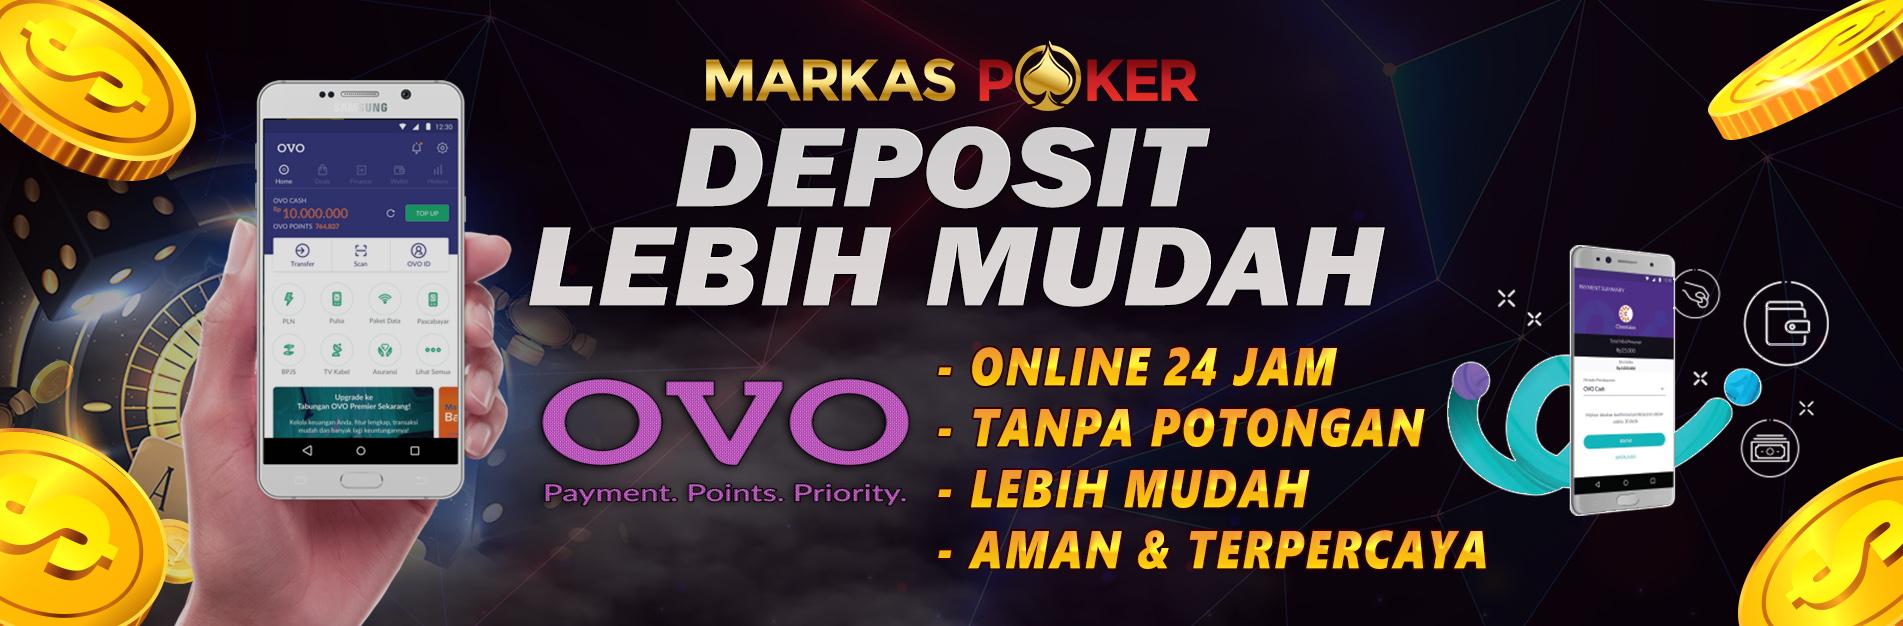 Deposit Pakai OVO